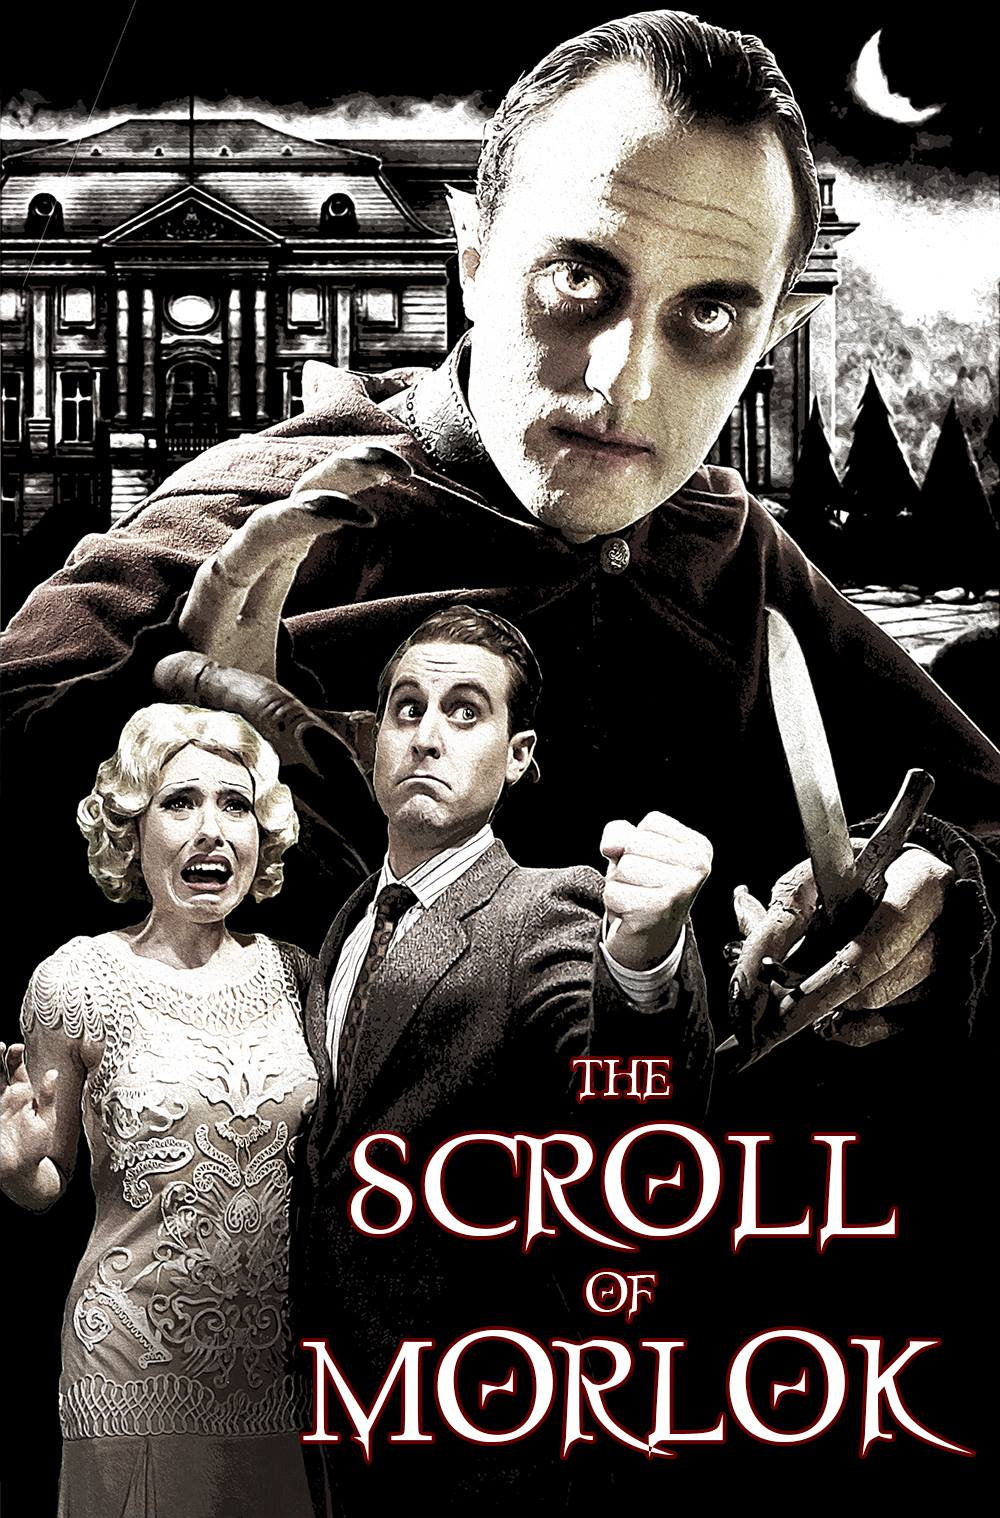 The Scroll of Morlok (2017)